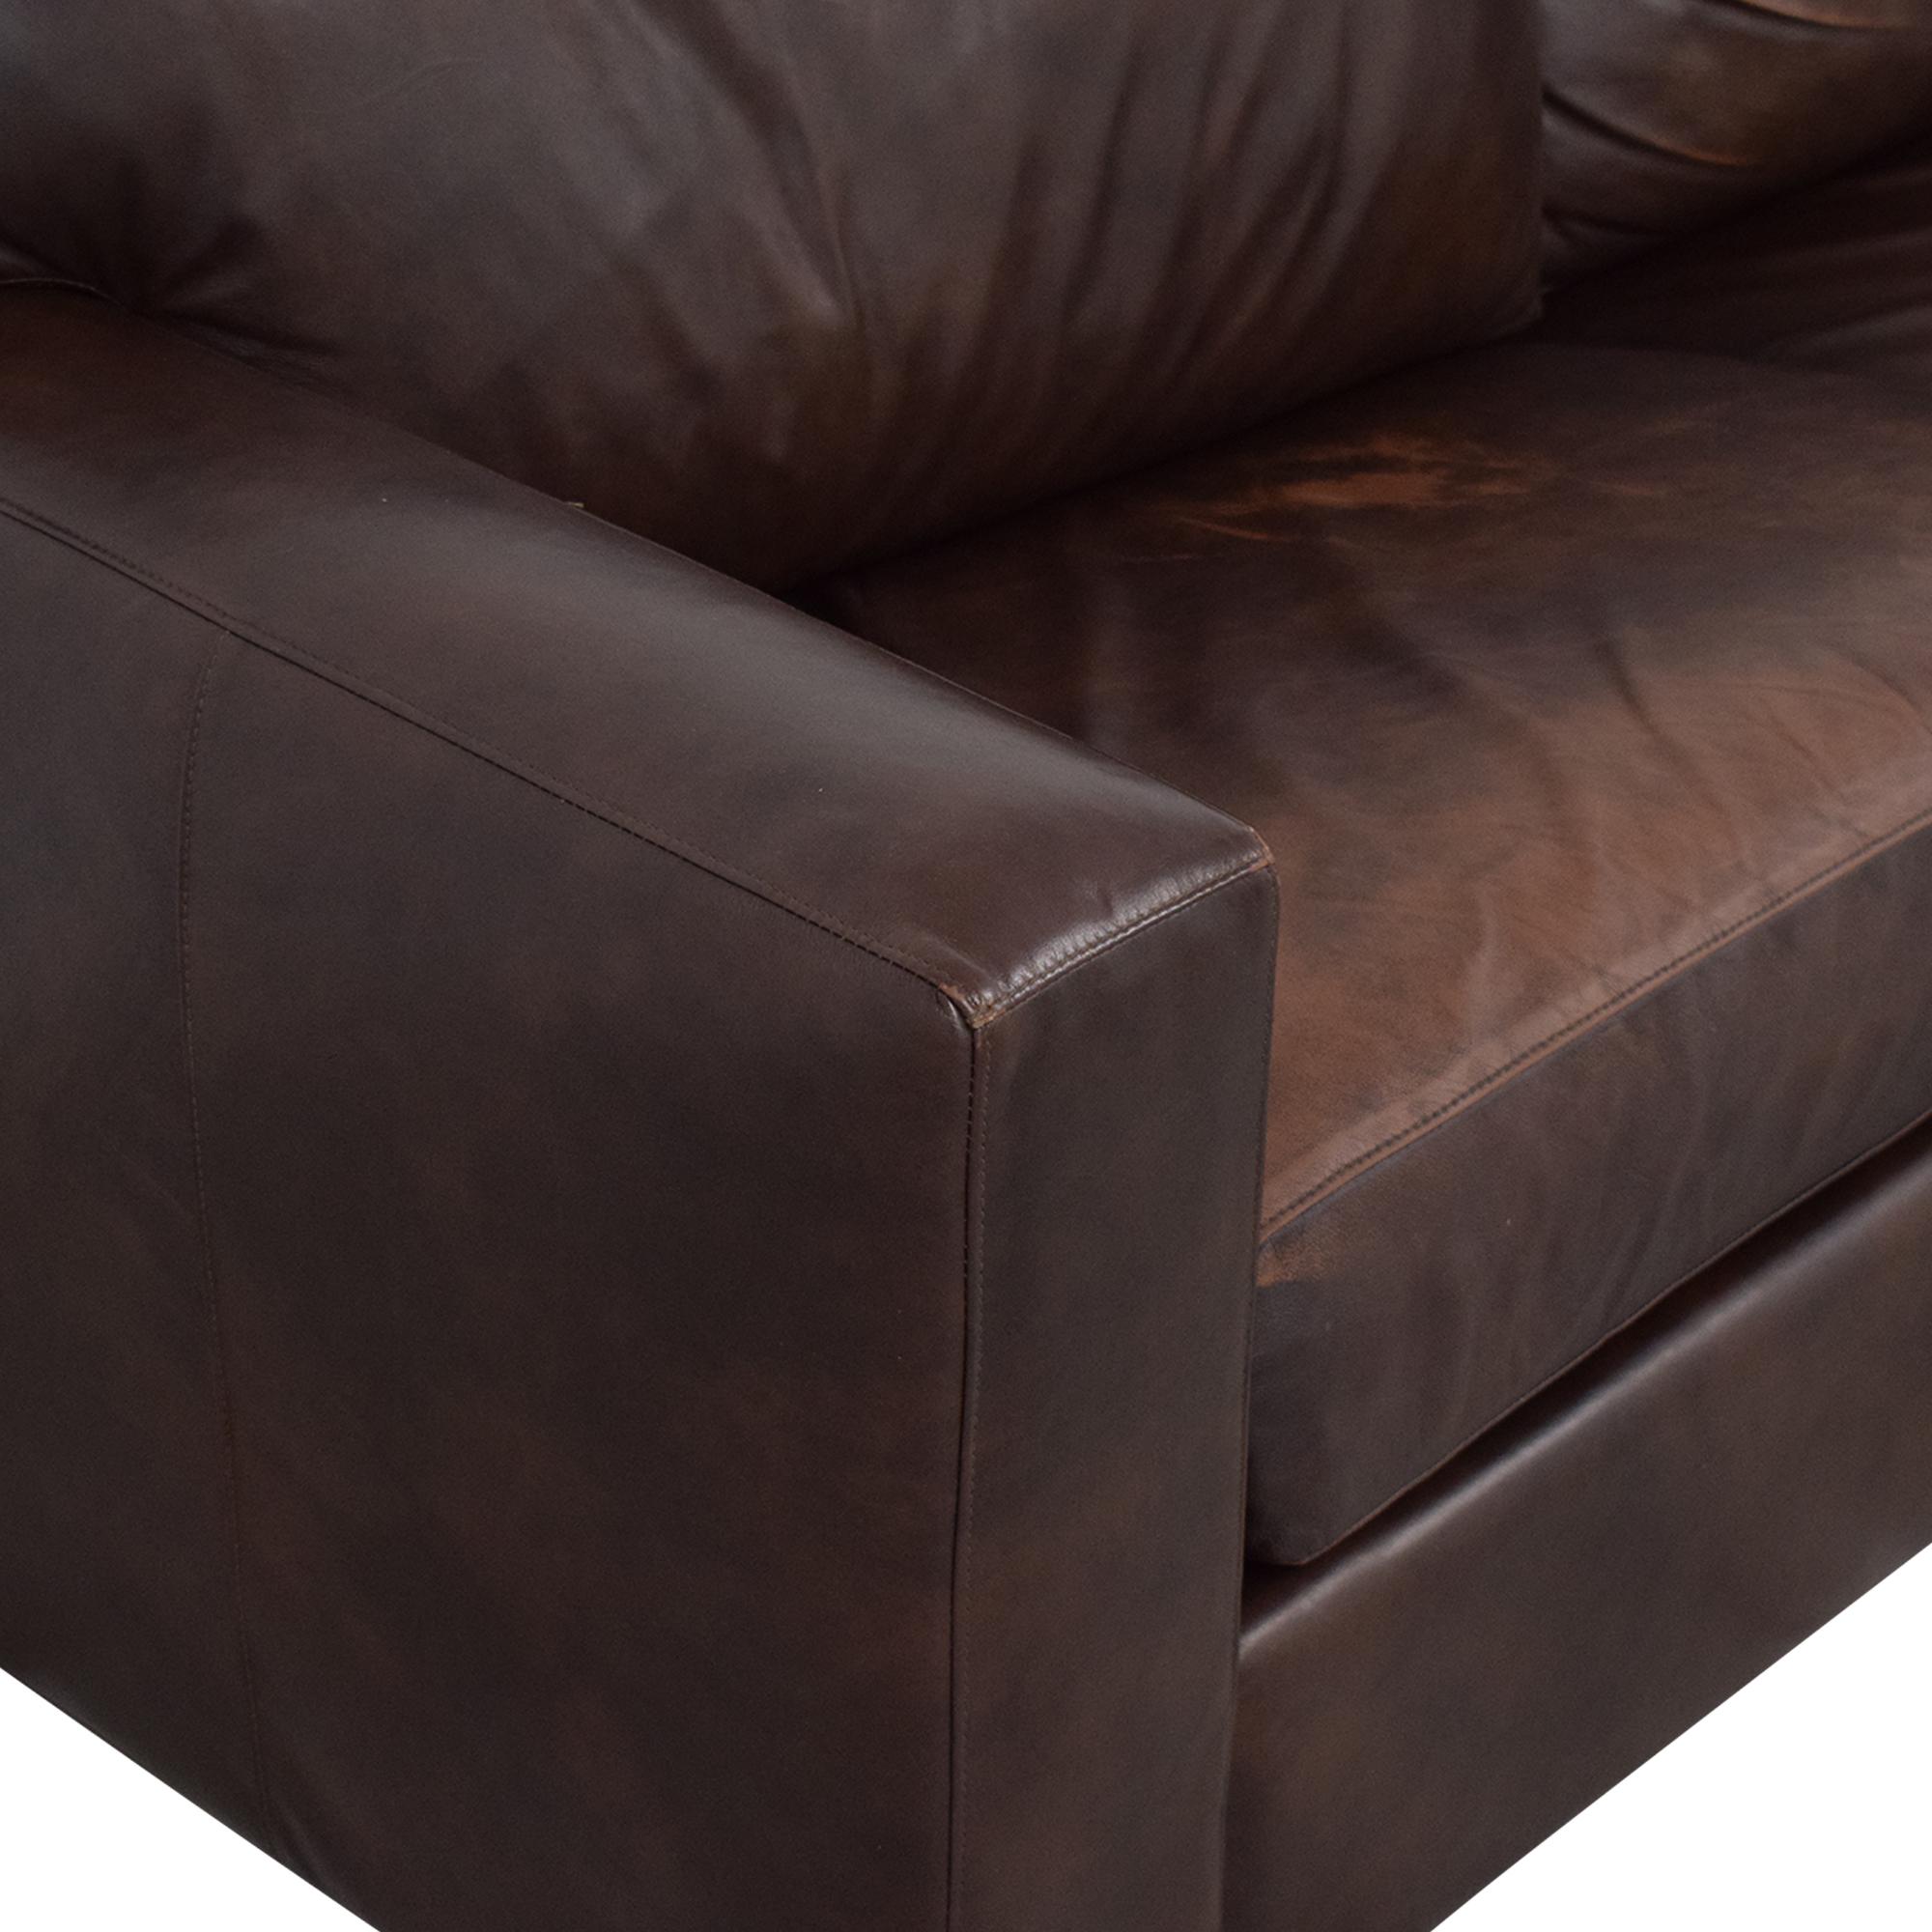 shop Crate & Barrel Axis II Leather Two Seat Queen Sleeper Sofa Crate & Barrel